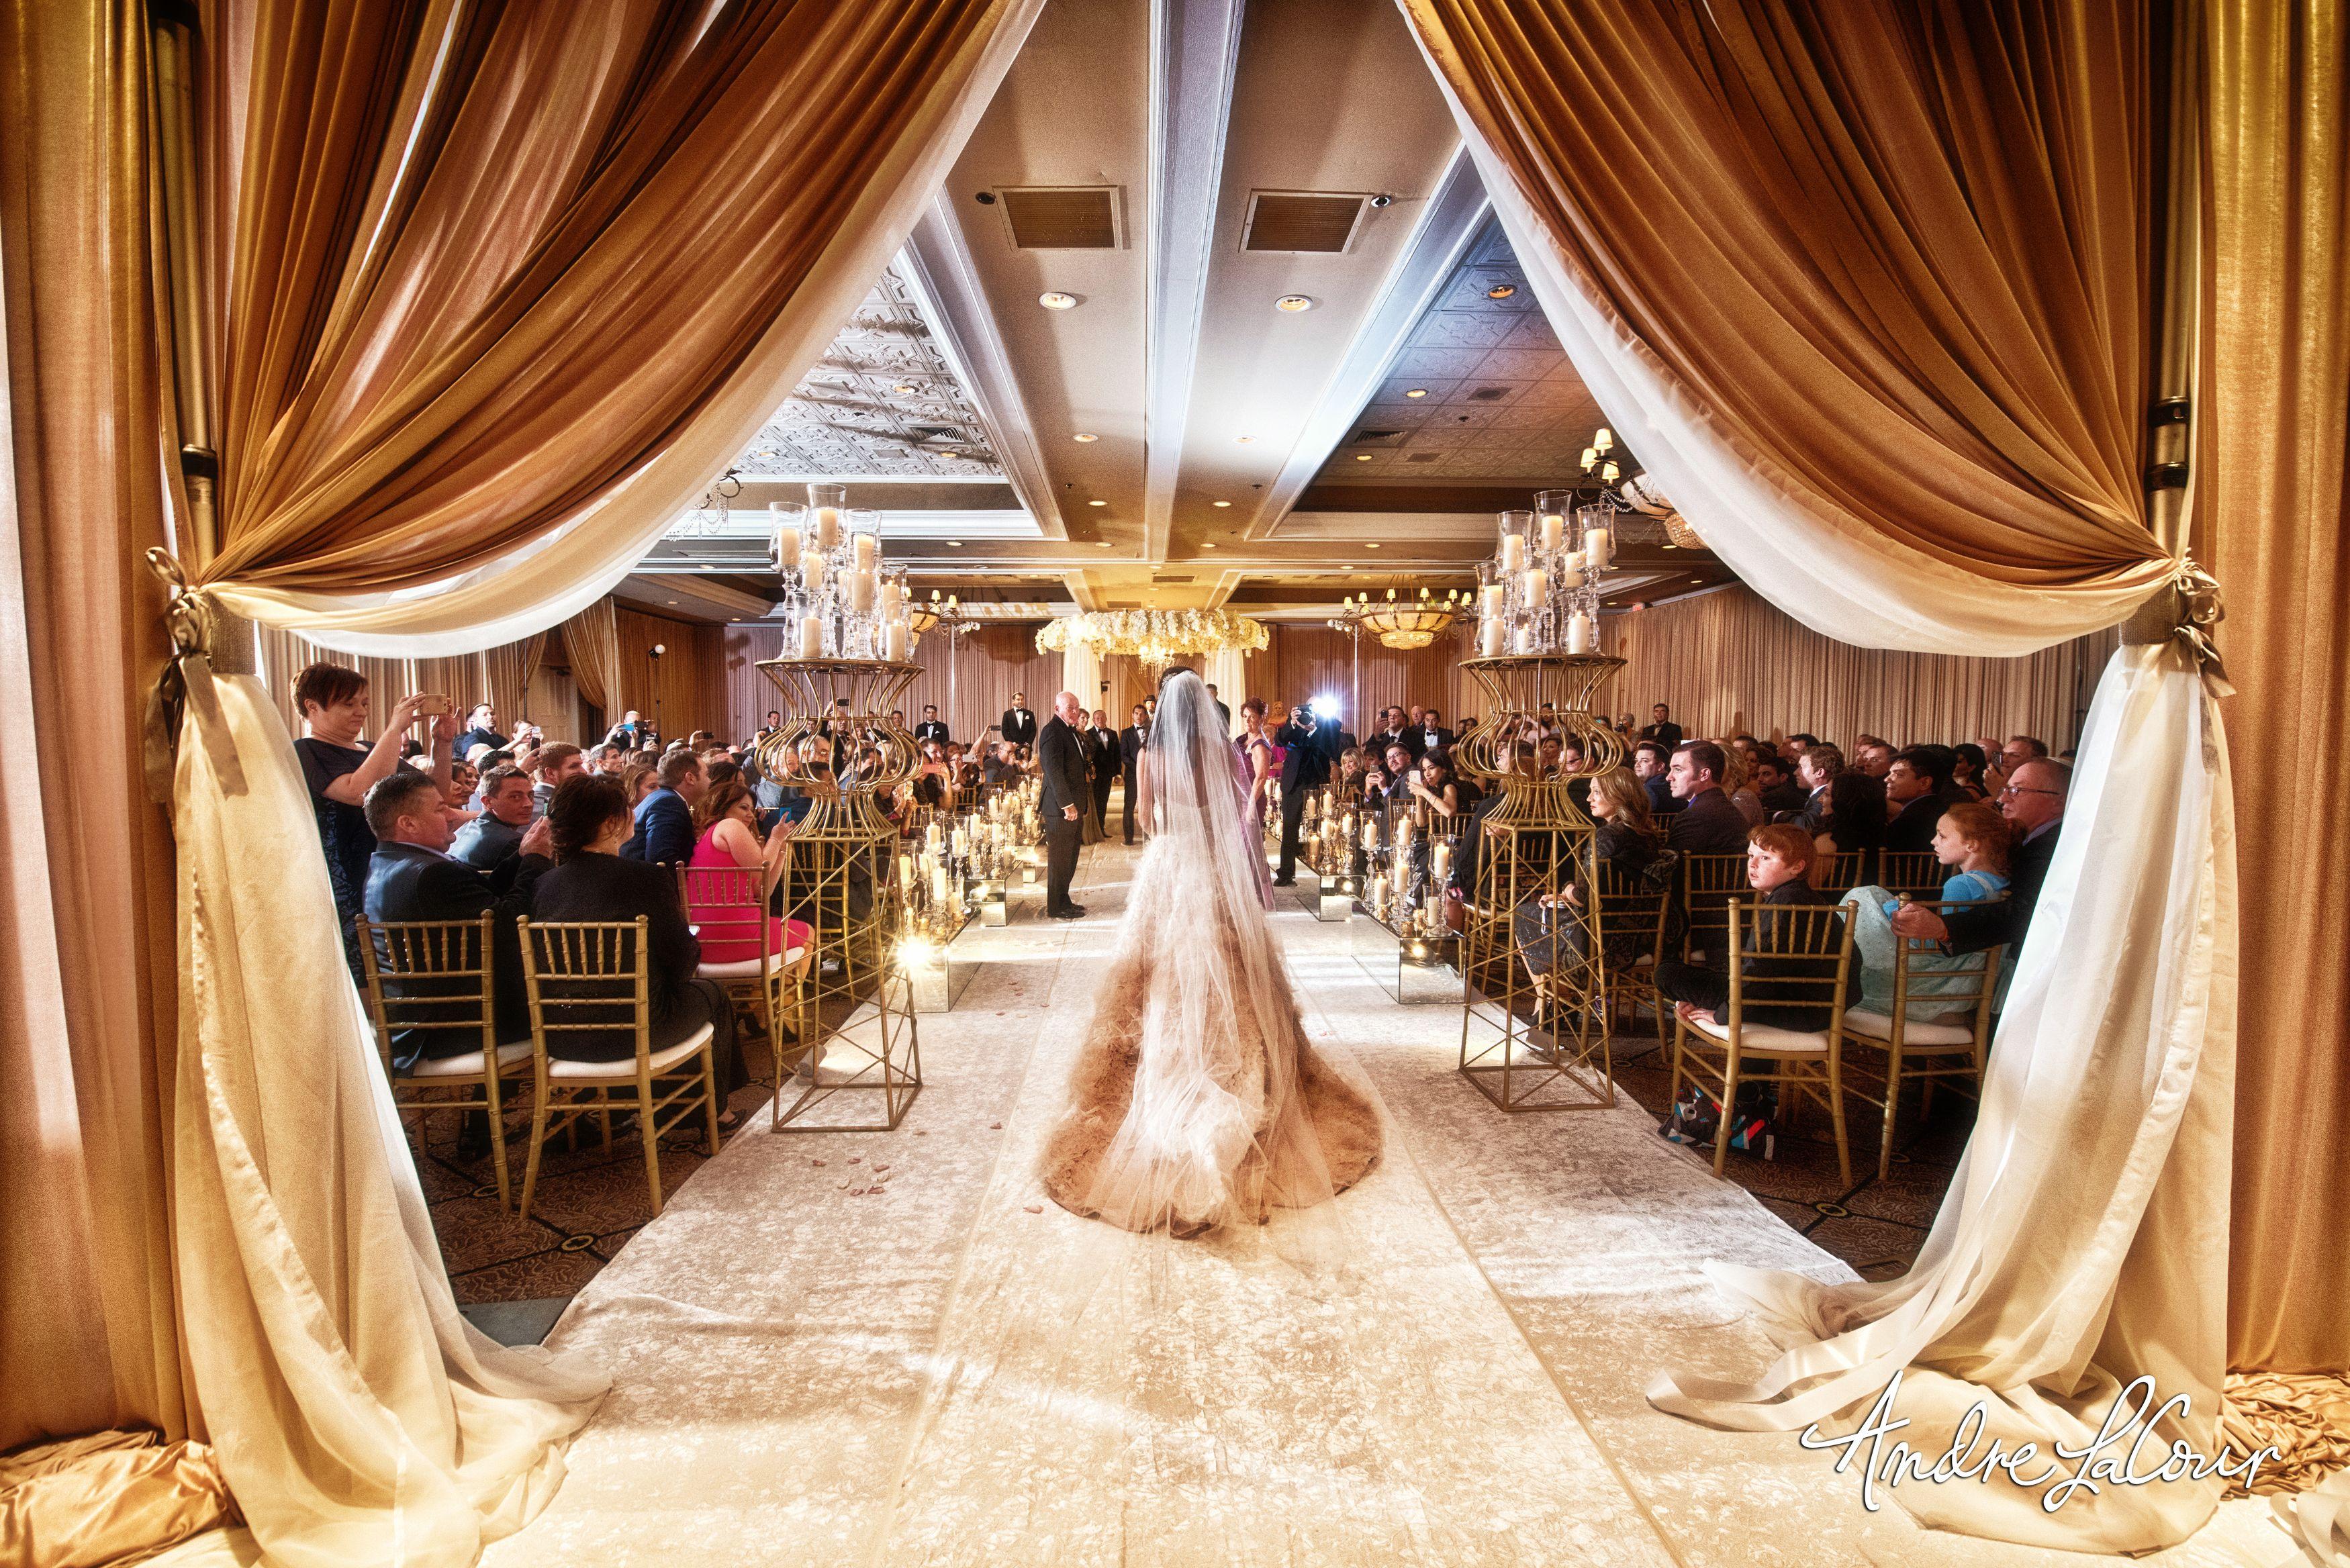 Luxury Wedding Decorations Floral Chicago Yanni Design Studio Chicago Wedding Venues Hotel Wedding Ceremony Decorations Hotel Wedding Ceremony